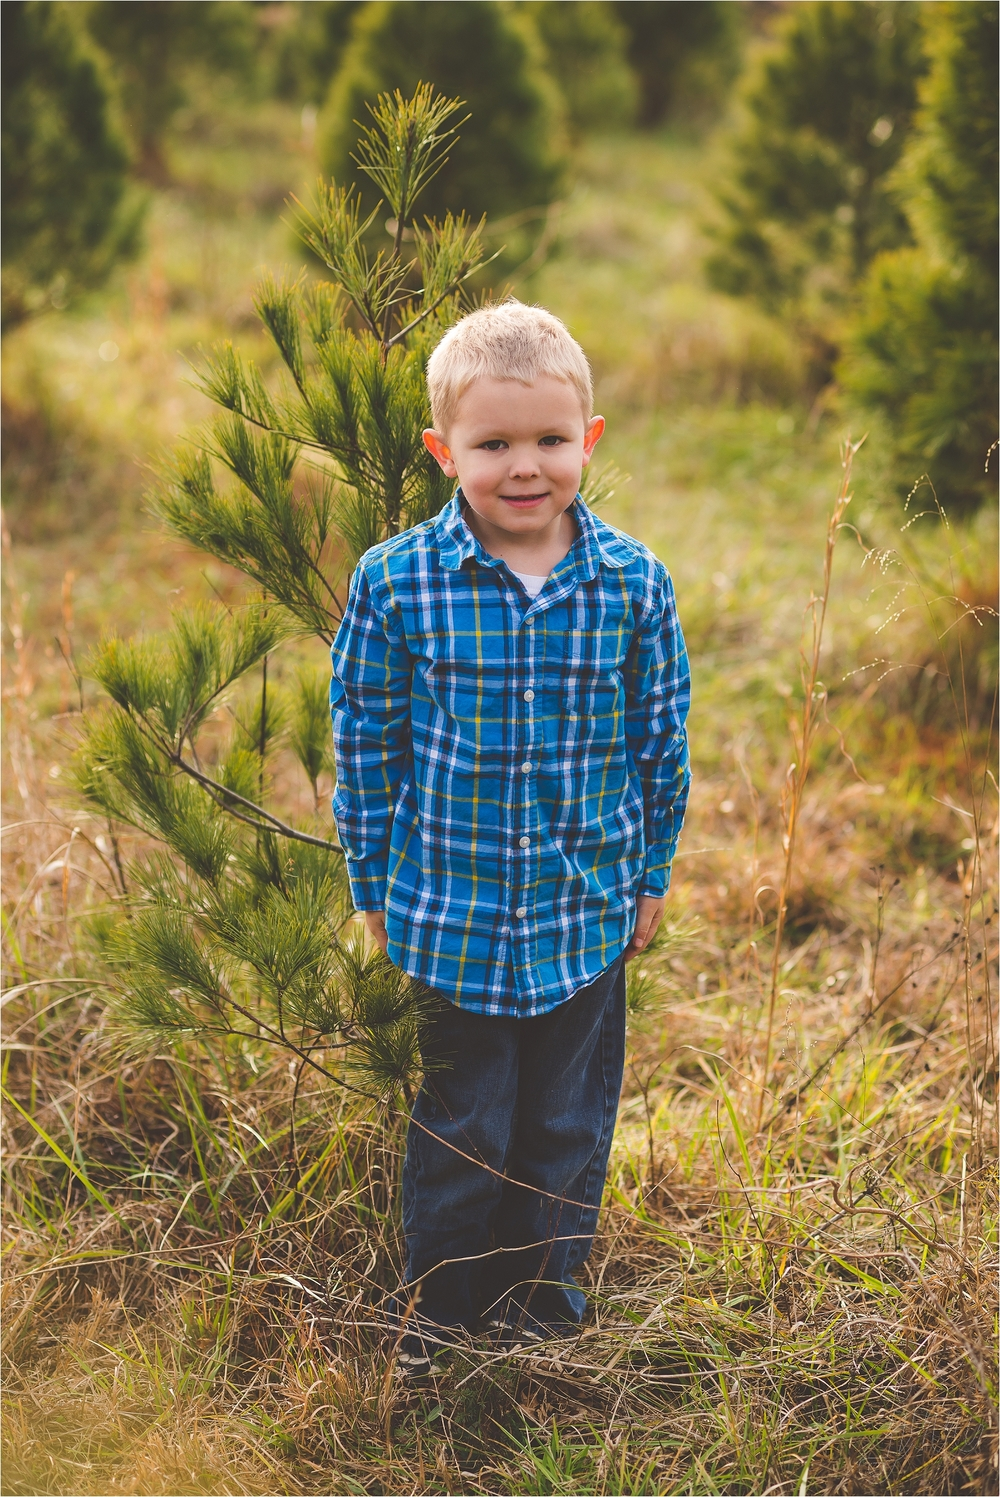 christmas-tree-farm-session-pnw-jannicka-mayte_0026.jpg